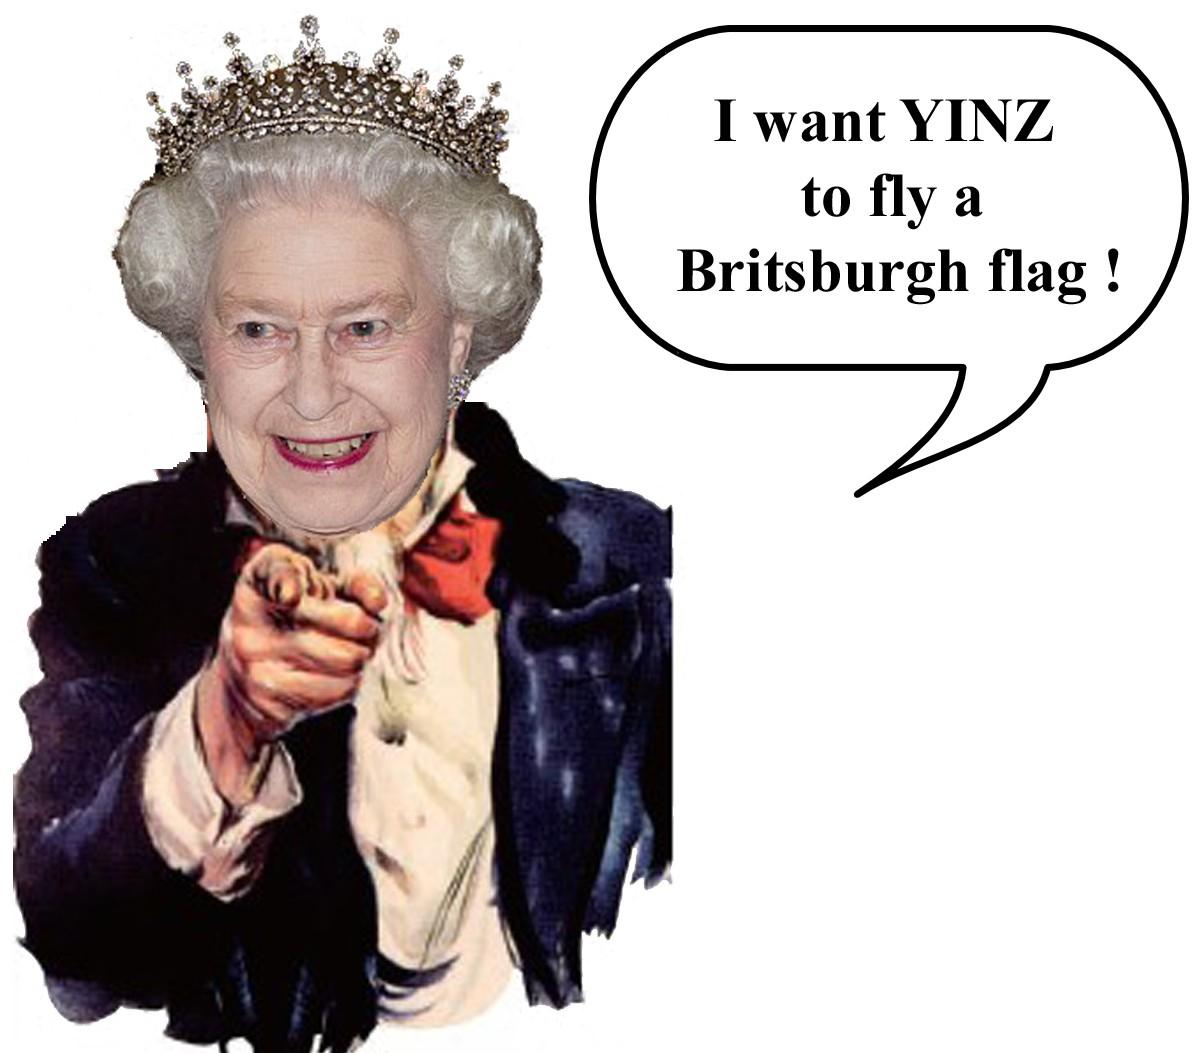 3' x 5' Britsburgh Nylon Flag